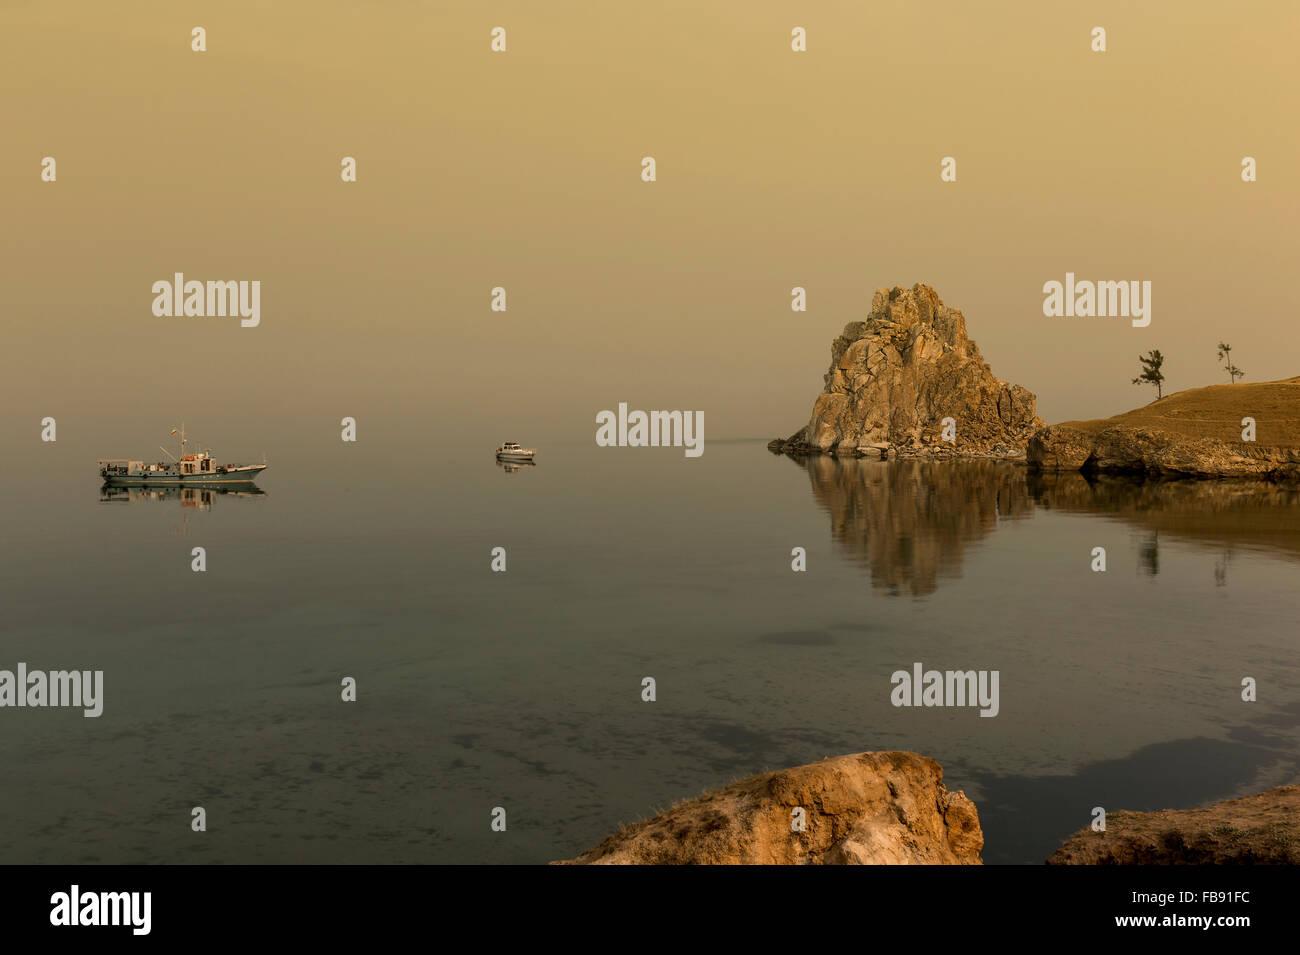 Early morning on Olkhon Island, Lake Baikal - Stock Image